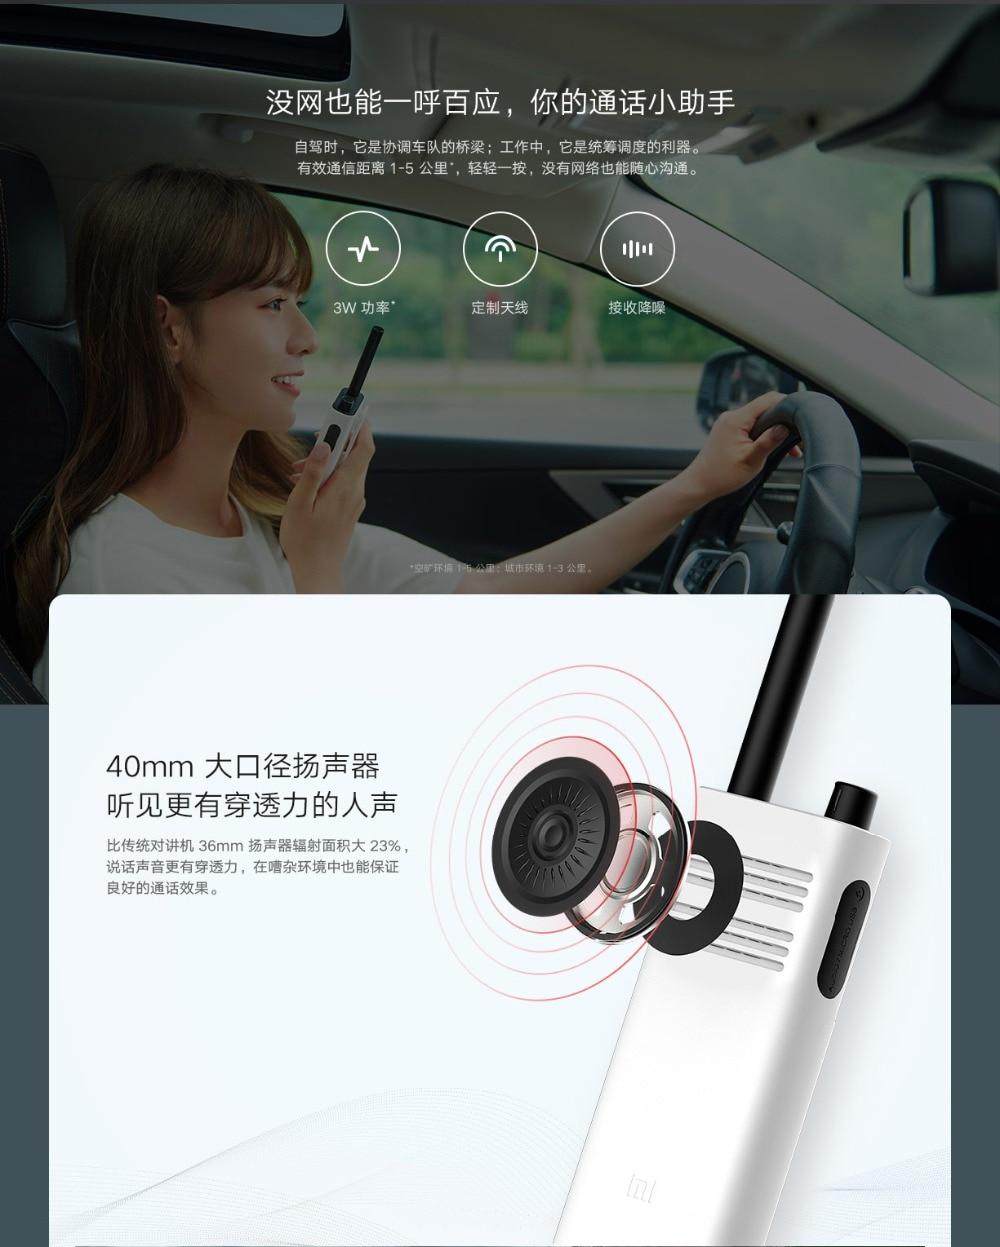 2020 New Xiaomi Mijia Walkie Talkie Lite Civil 5 Km Intercom Outdoor Handheld Mini Radio Talkie Walkie Work with mi home app (2)